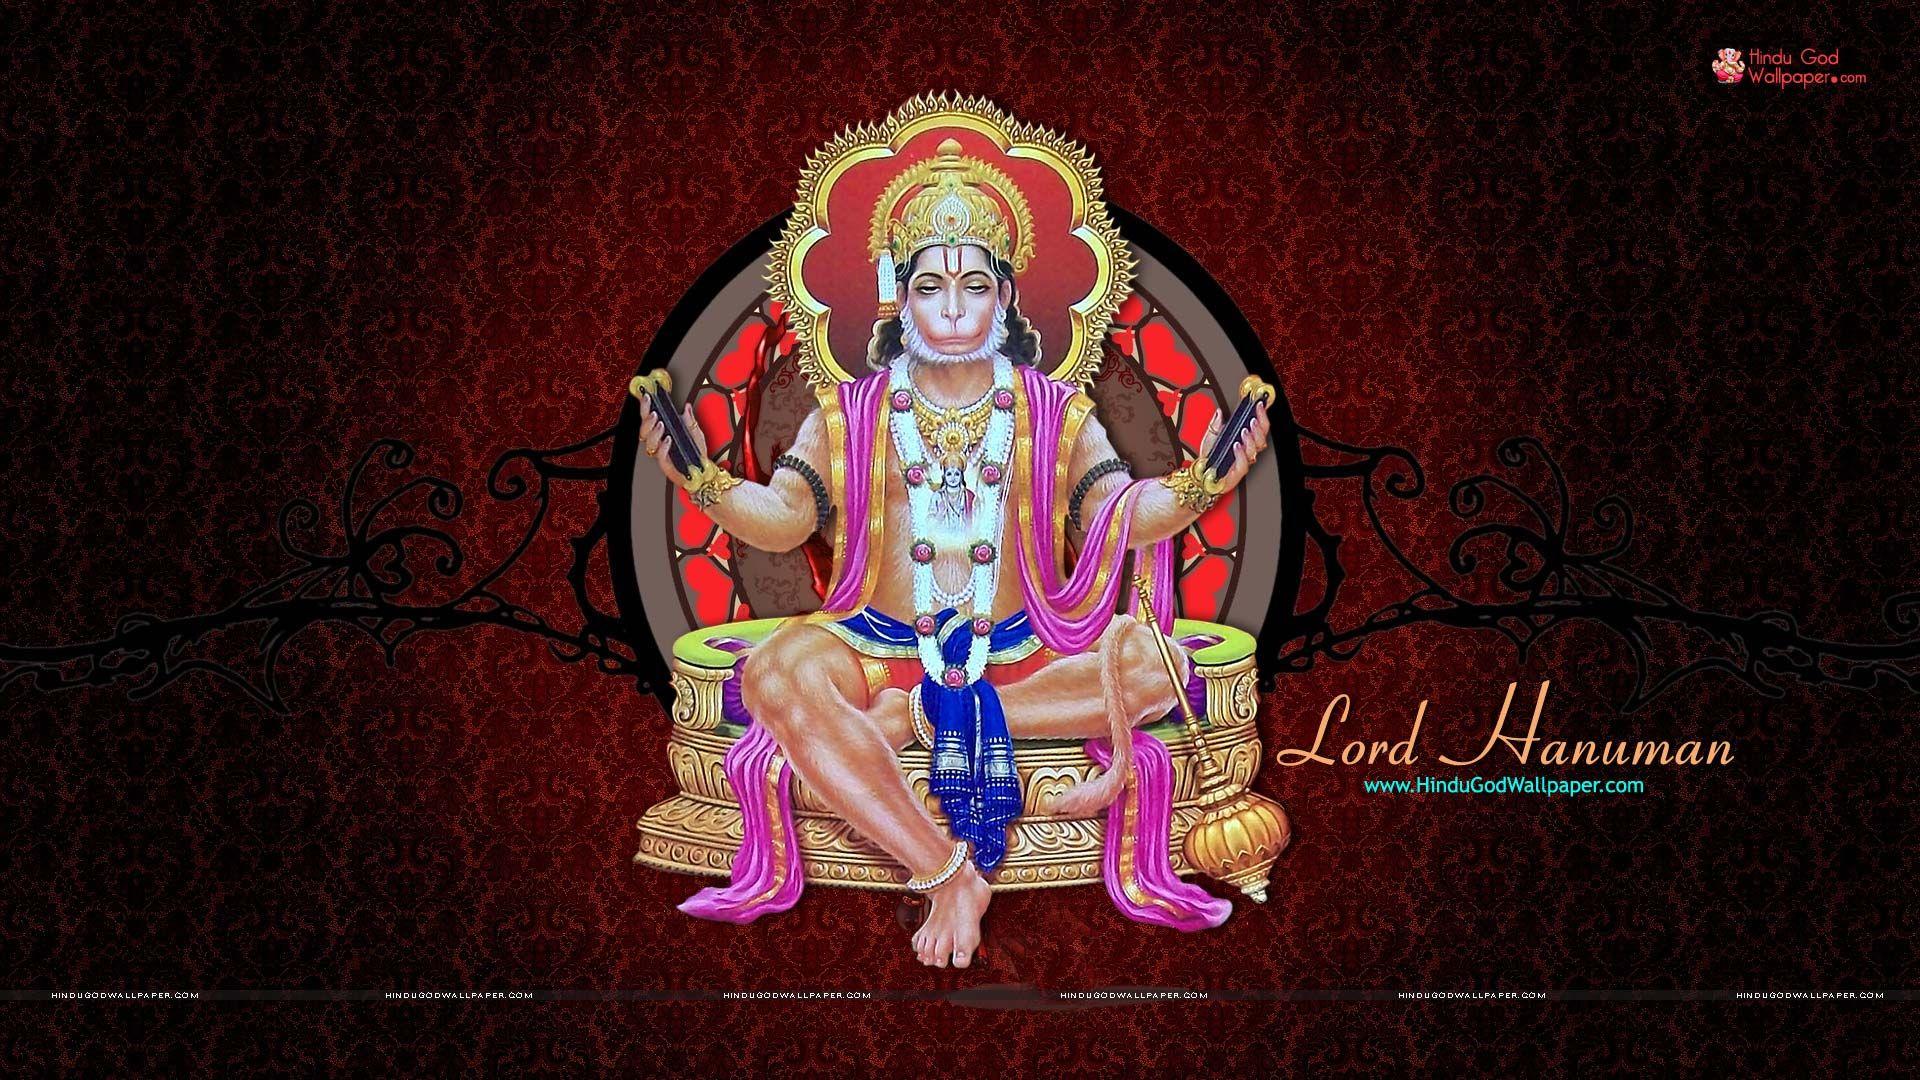 Lord Hanuman Hd Wallpapers 1080p Illustration 260934 Hd